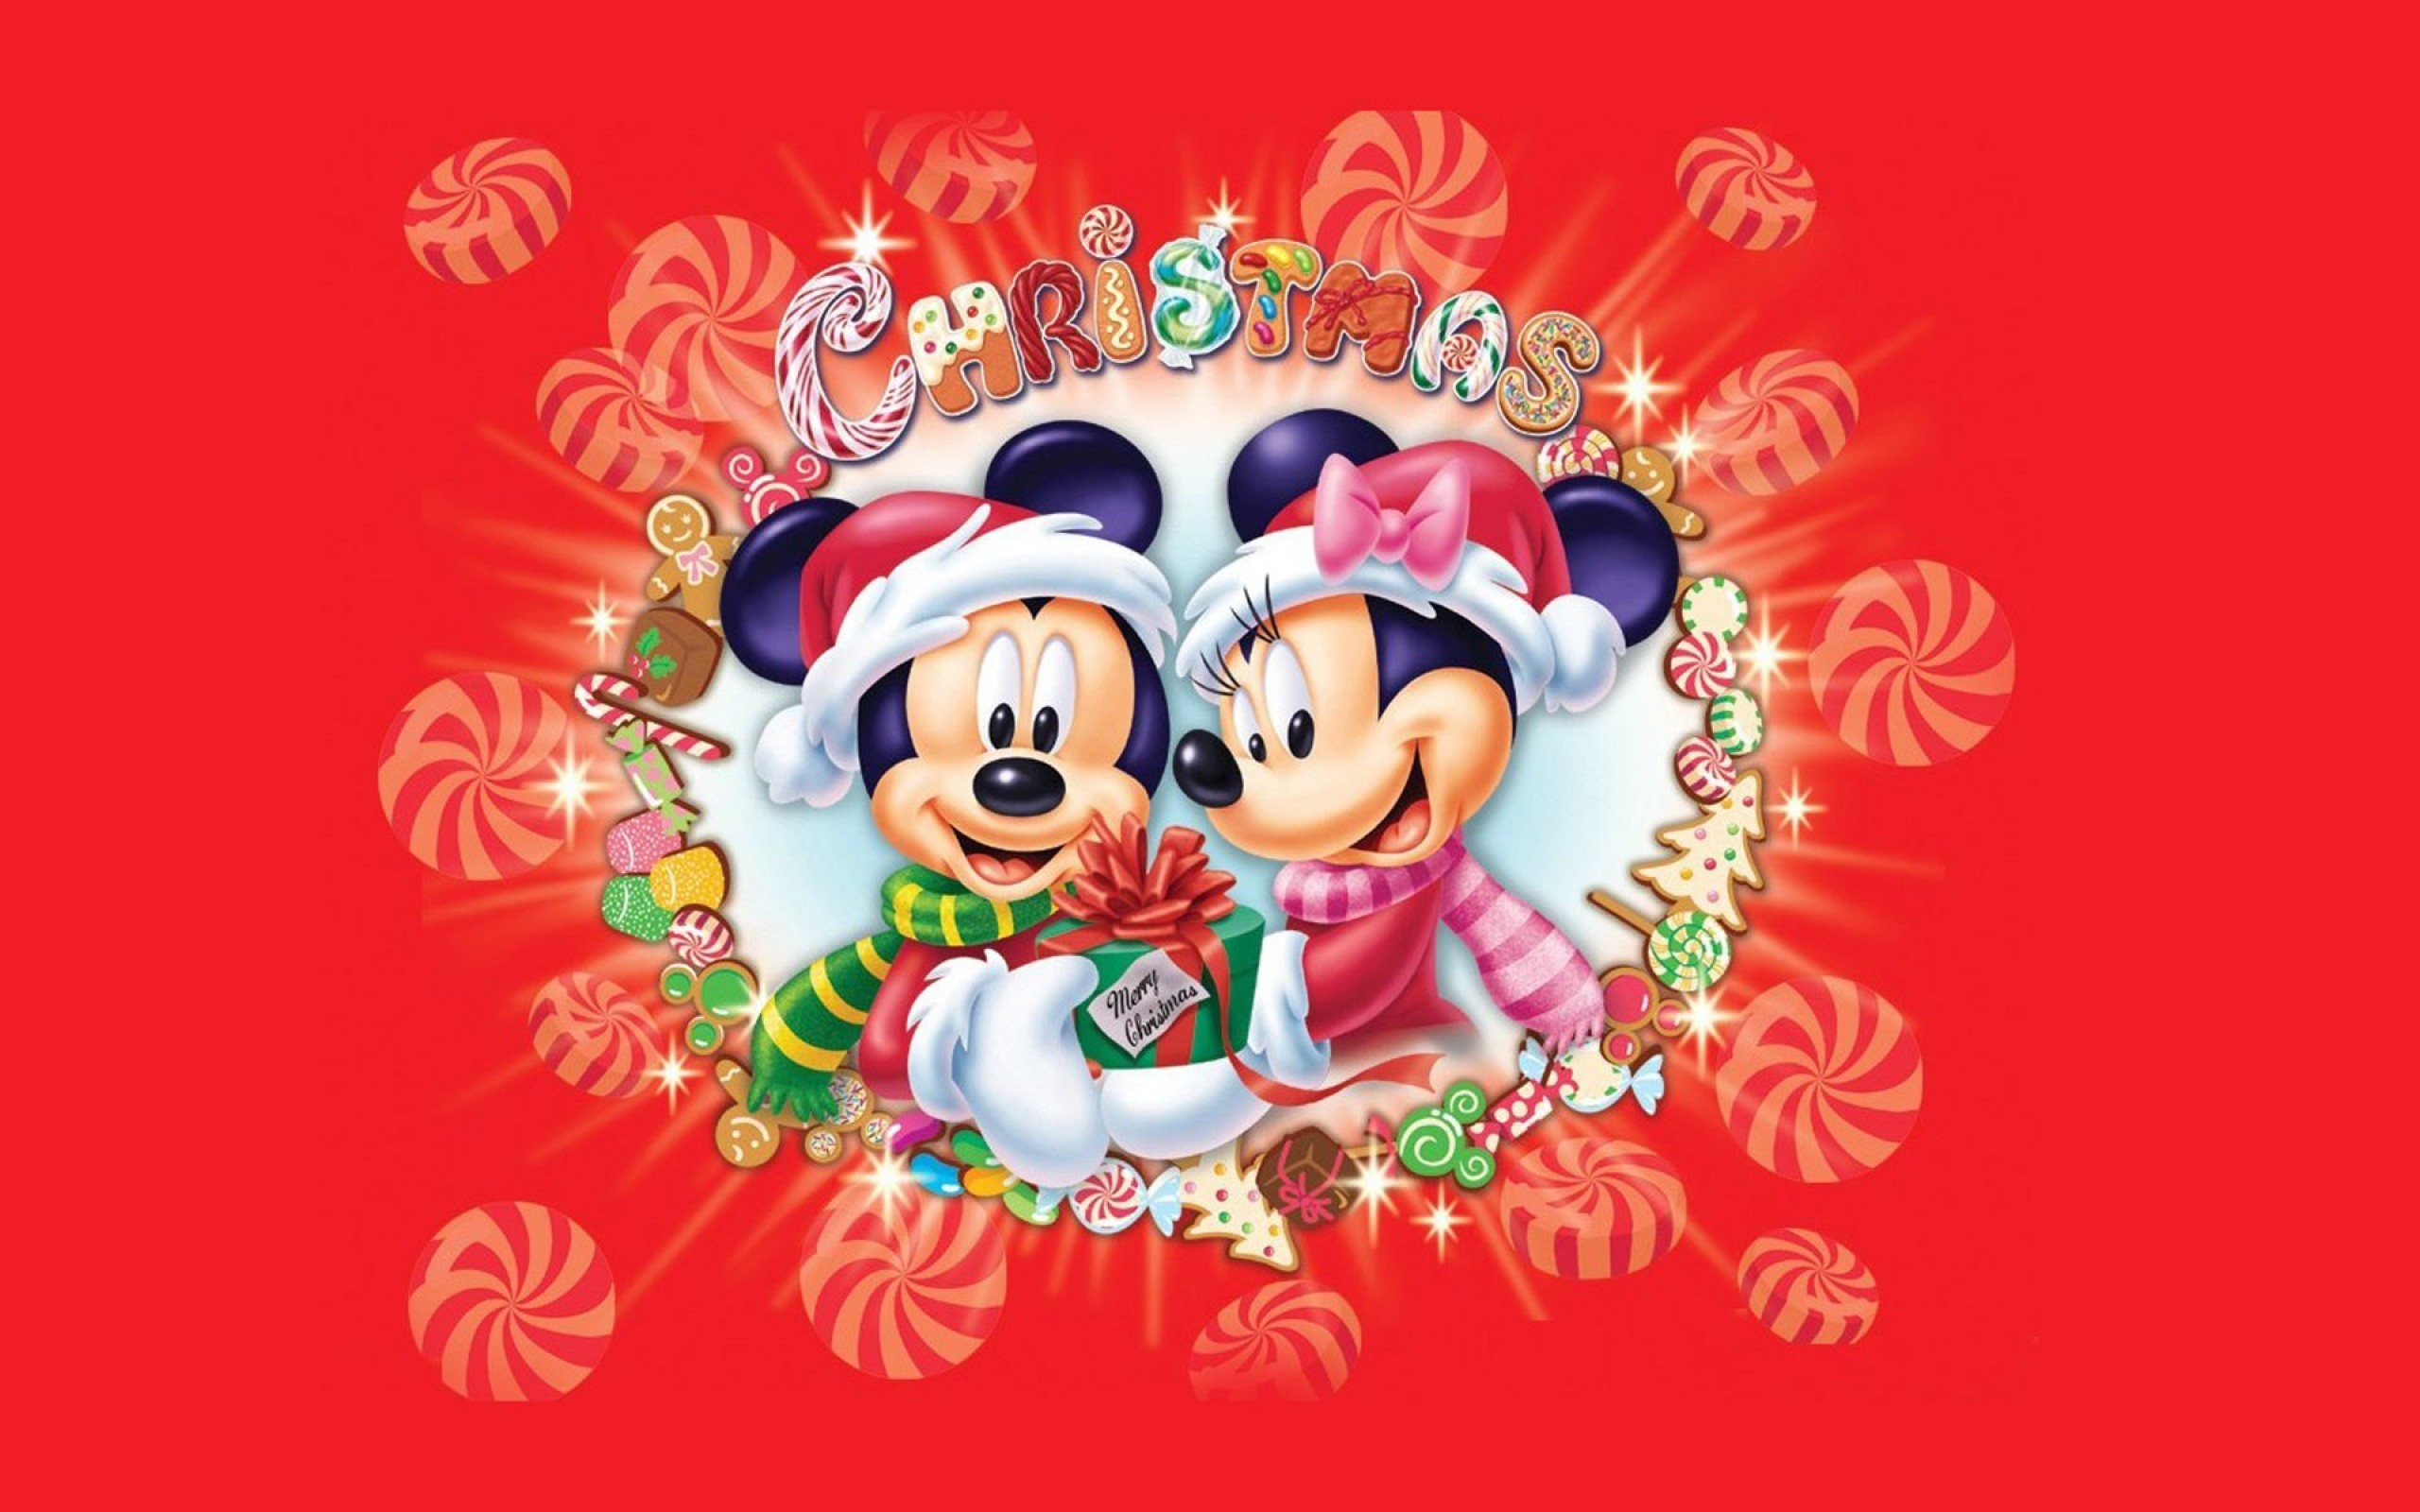 Xmas Stuff For > Mickey Mouse Christmas Wallpaper